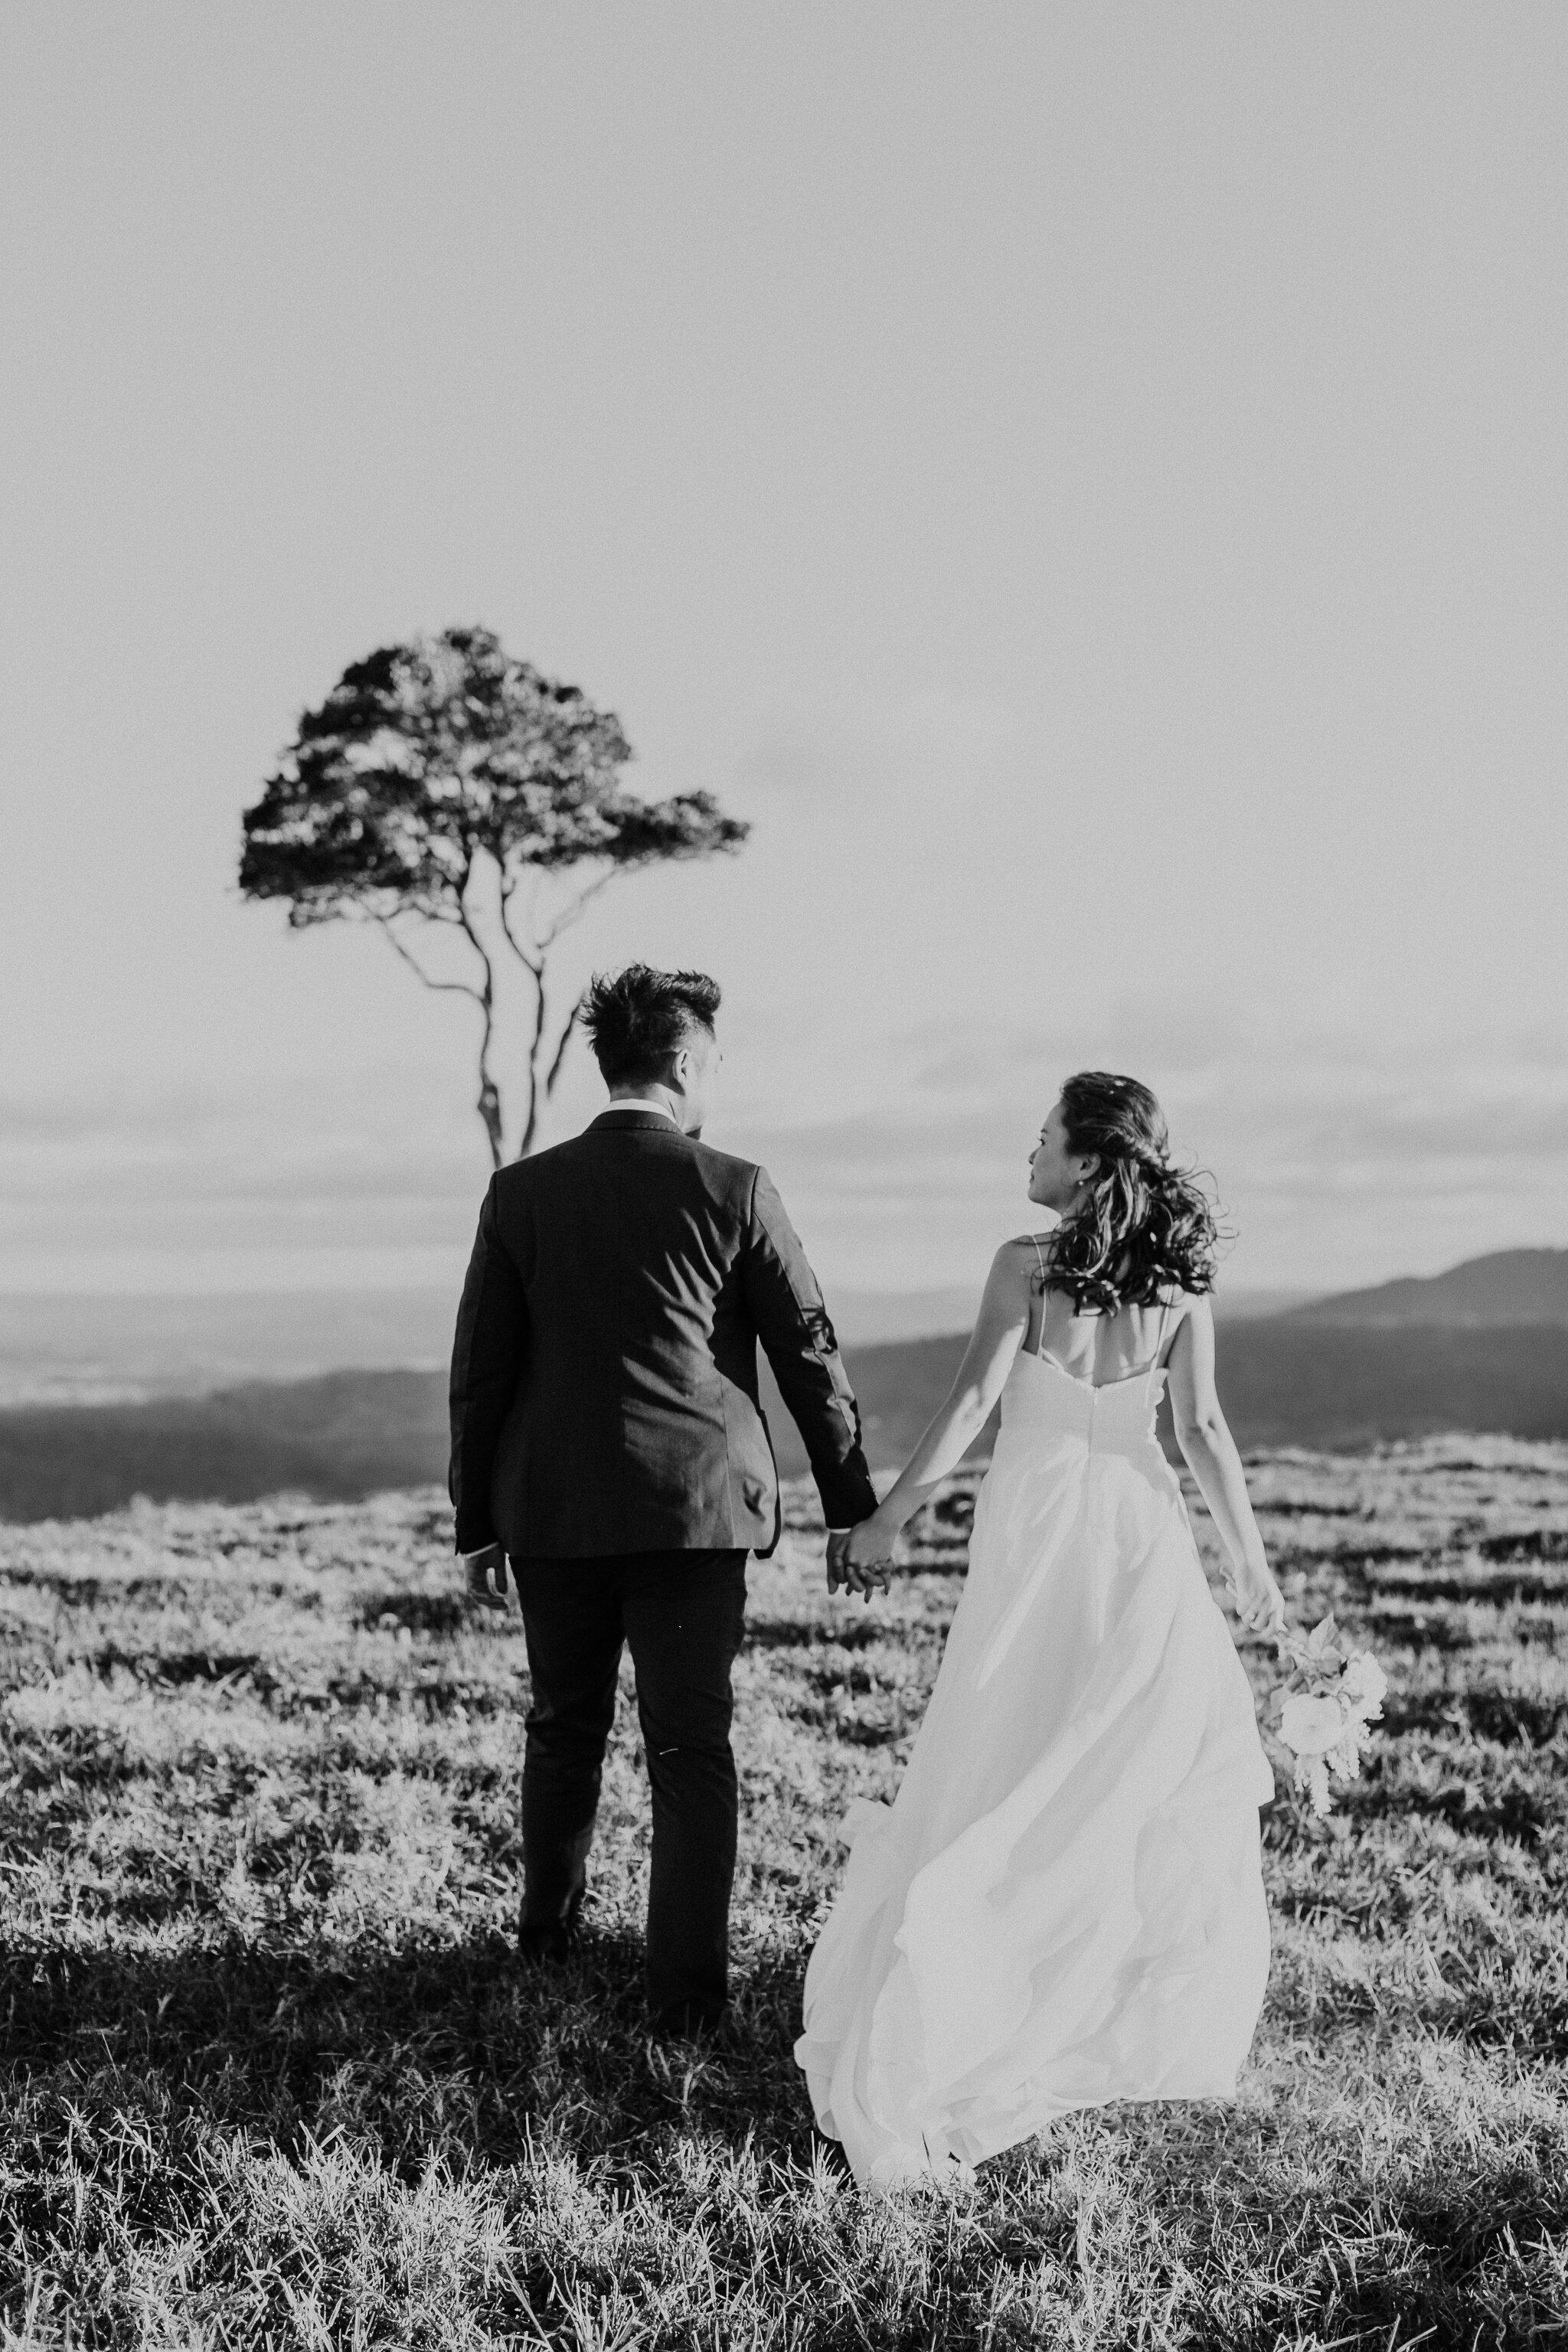 Maleny One Tree Hill Wedding - Maleny Wedding Photographer-4.jpg